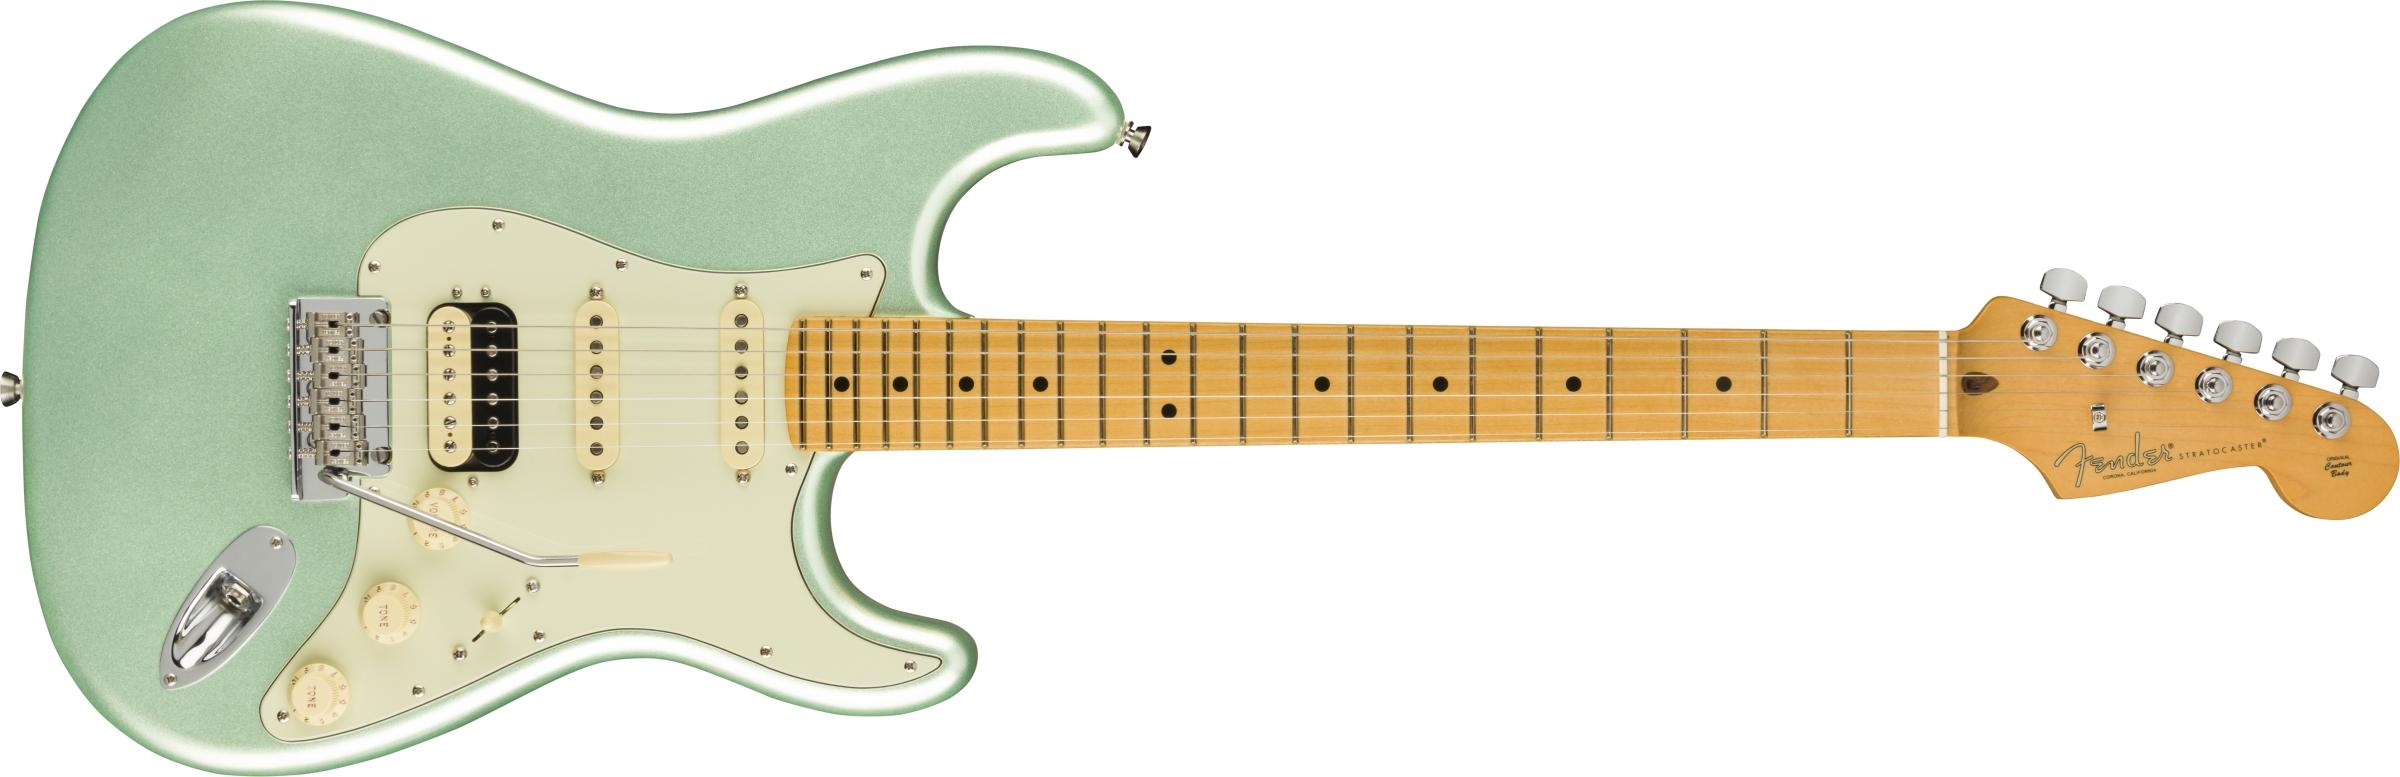 FENDER-American-Professional-II-Stratocaster-HSS-MN-Mystic-Surf-Green-0113912718-sku-24111